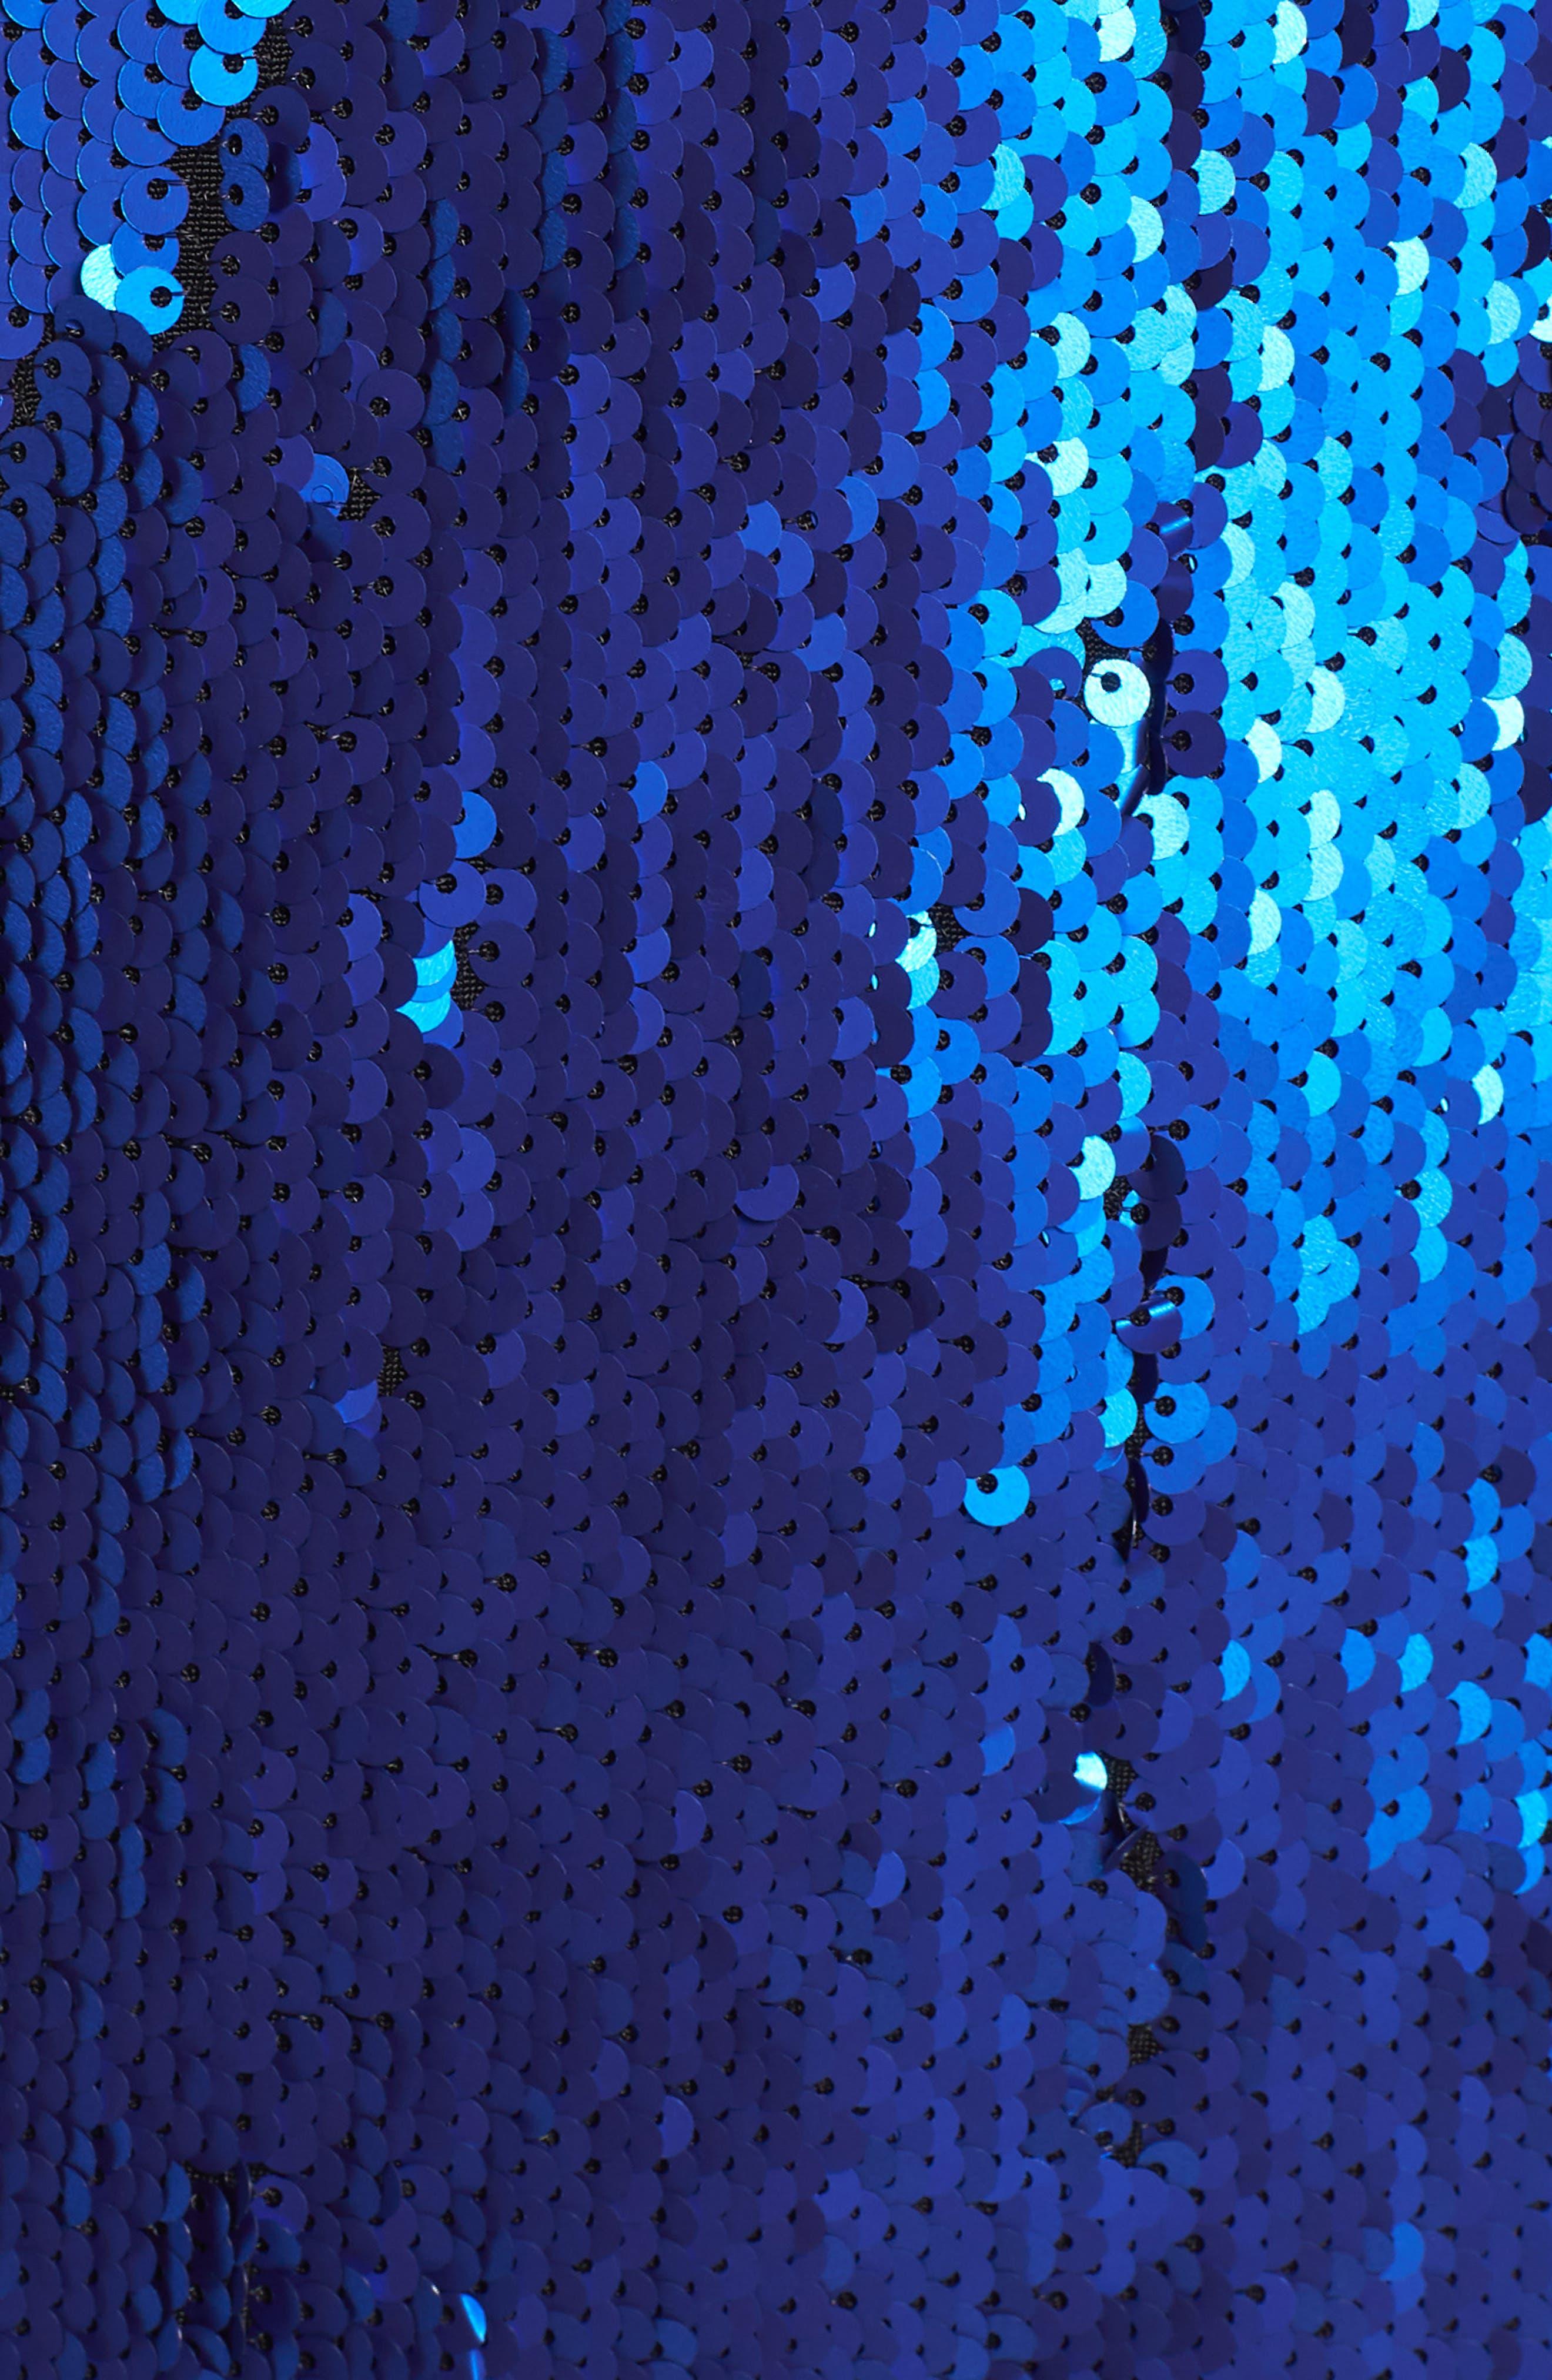 Zoe Sequin V-Neck Cocktail Sheath Dress,                             Alternate thumbnail 6, color,                             ELECTRIC BLUE